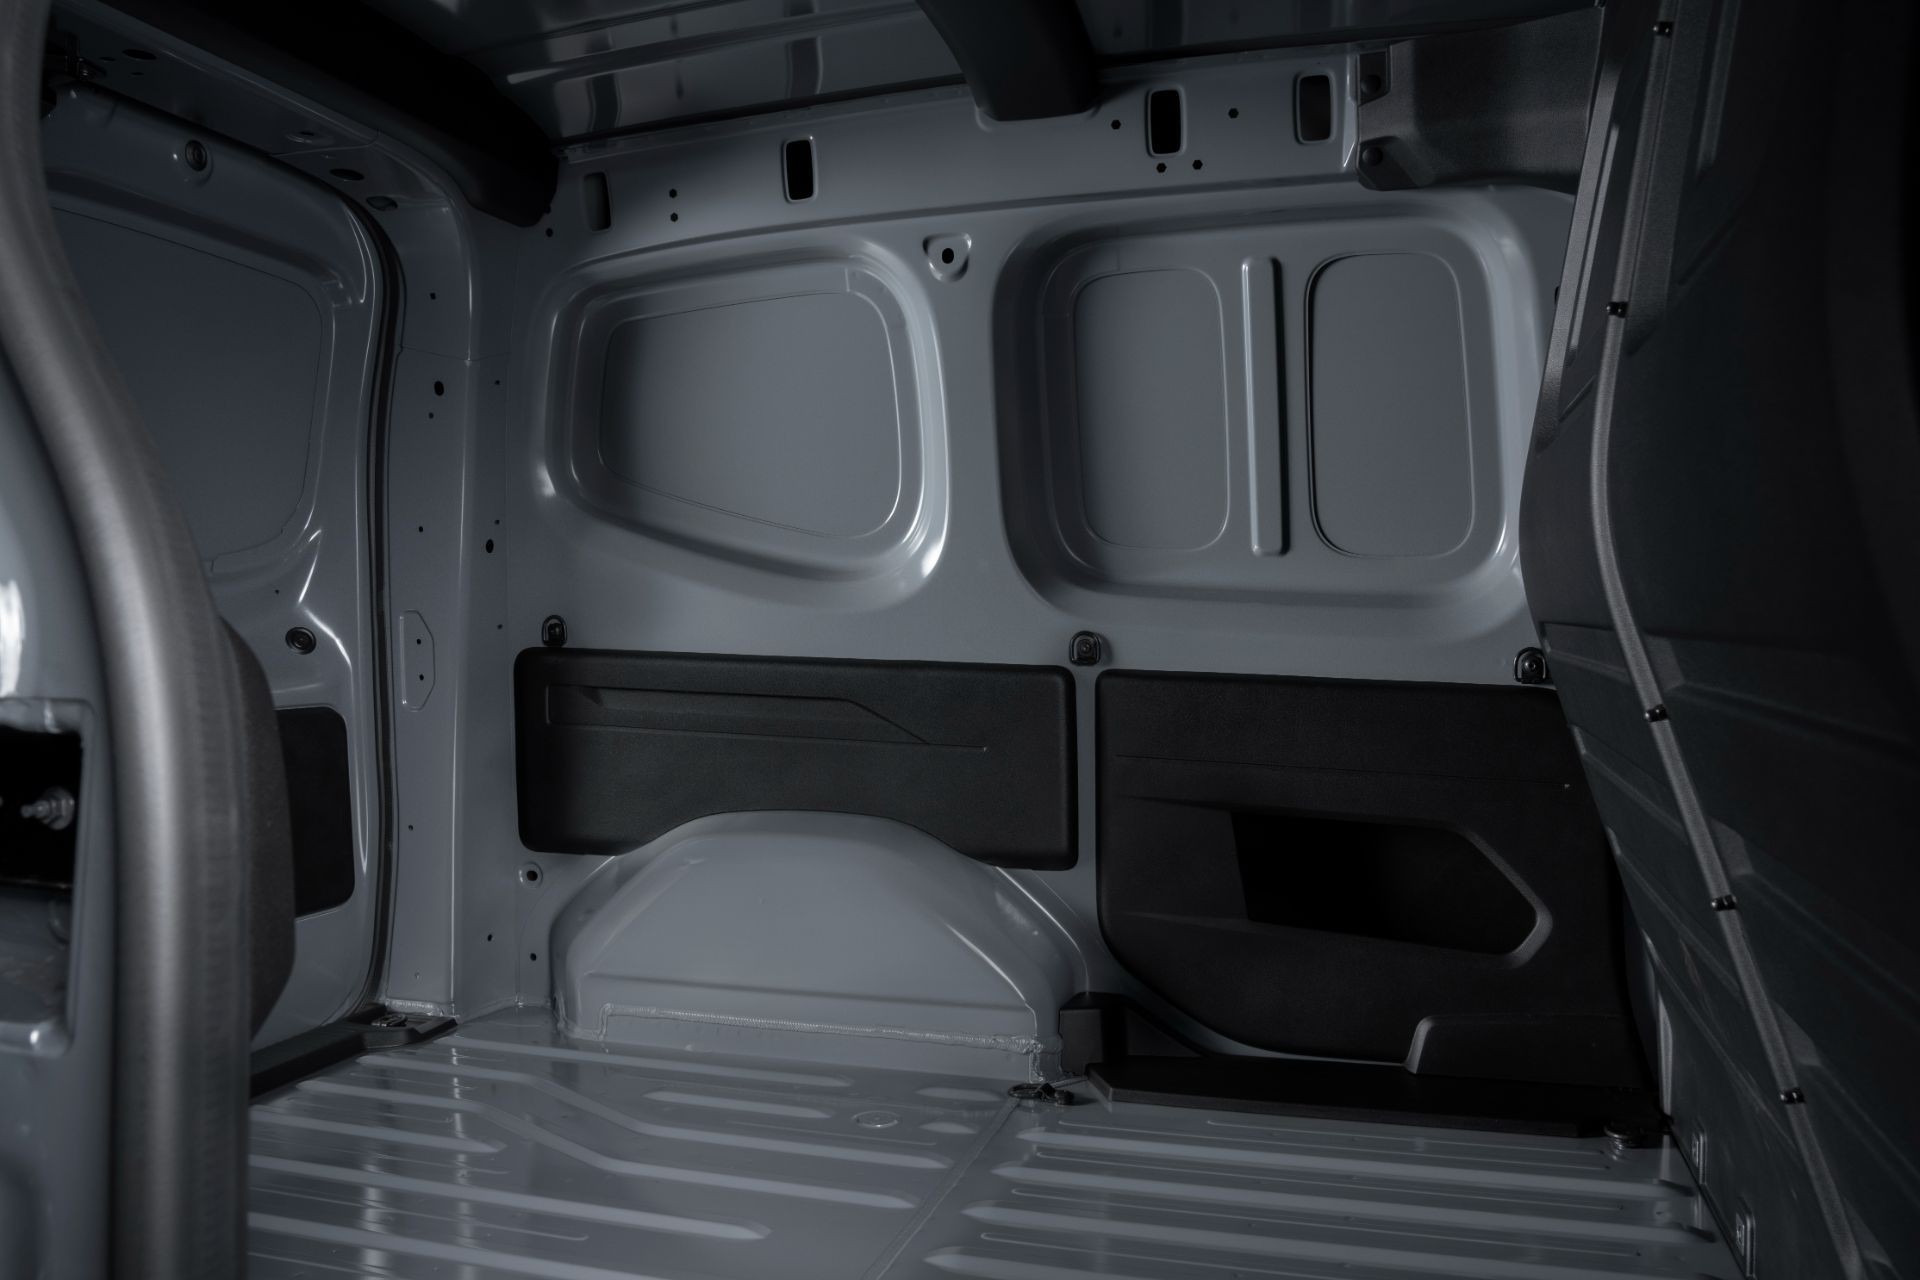 2022-Nissan-Townstar-petrol-van-dynamic-22